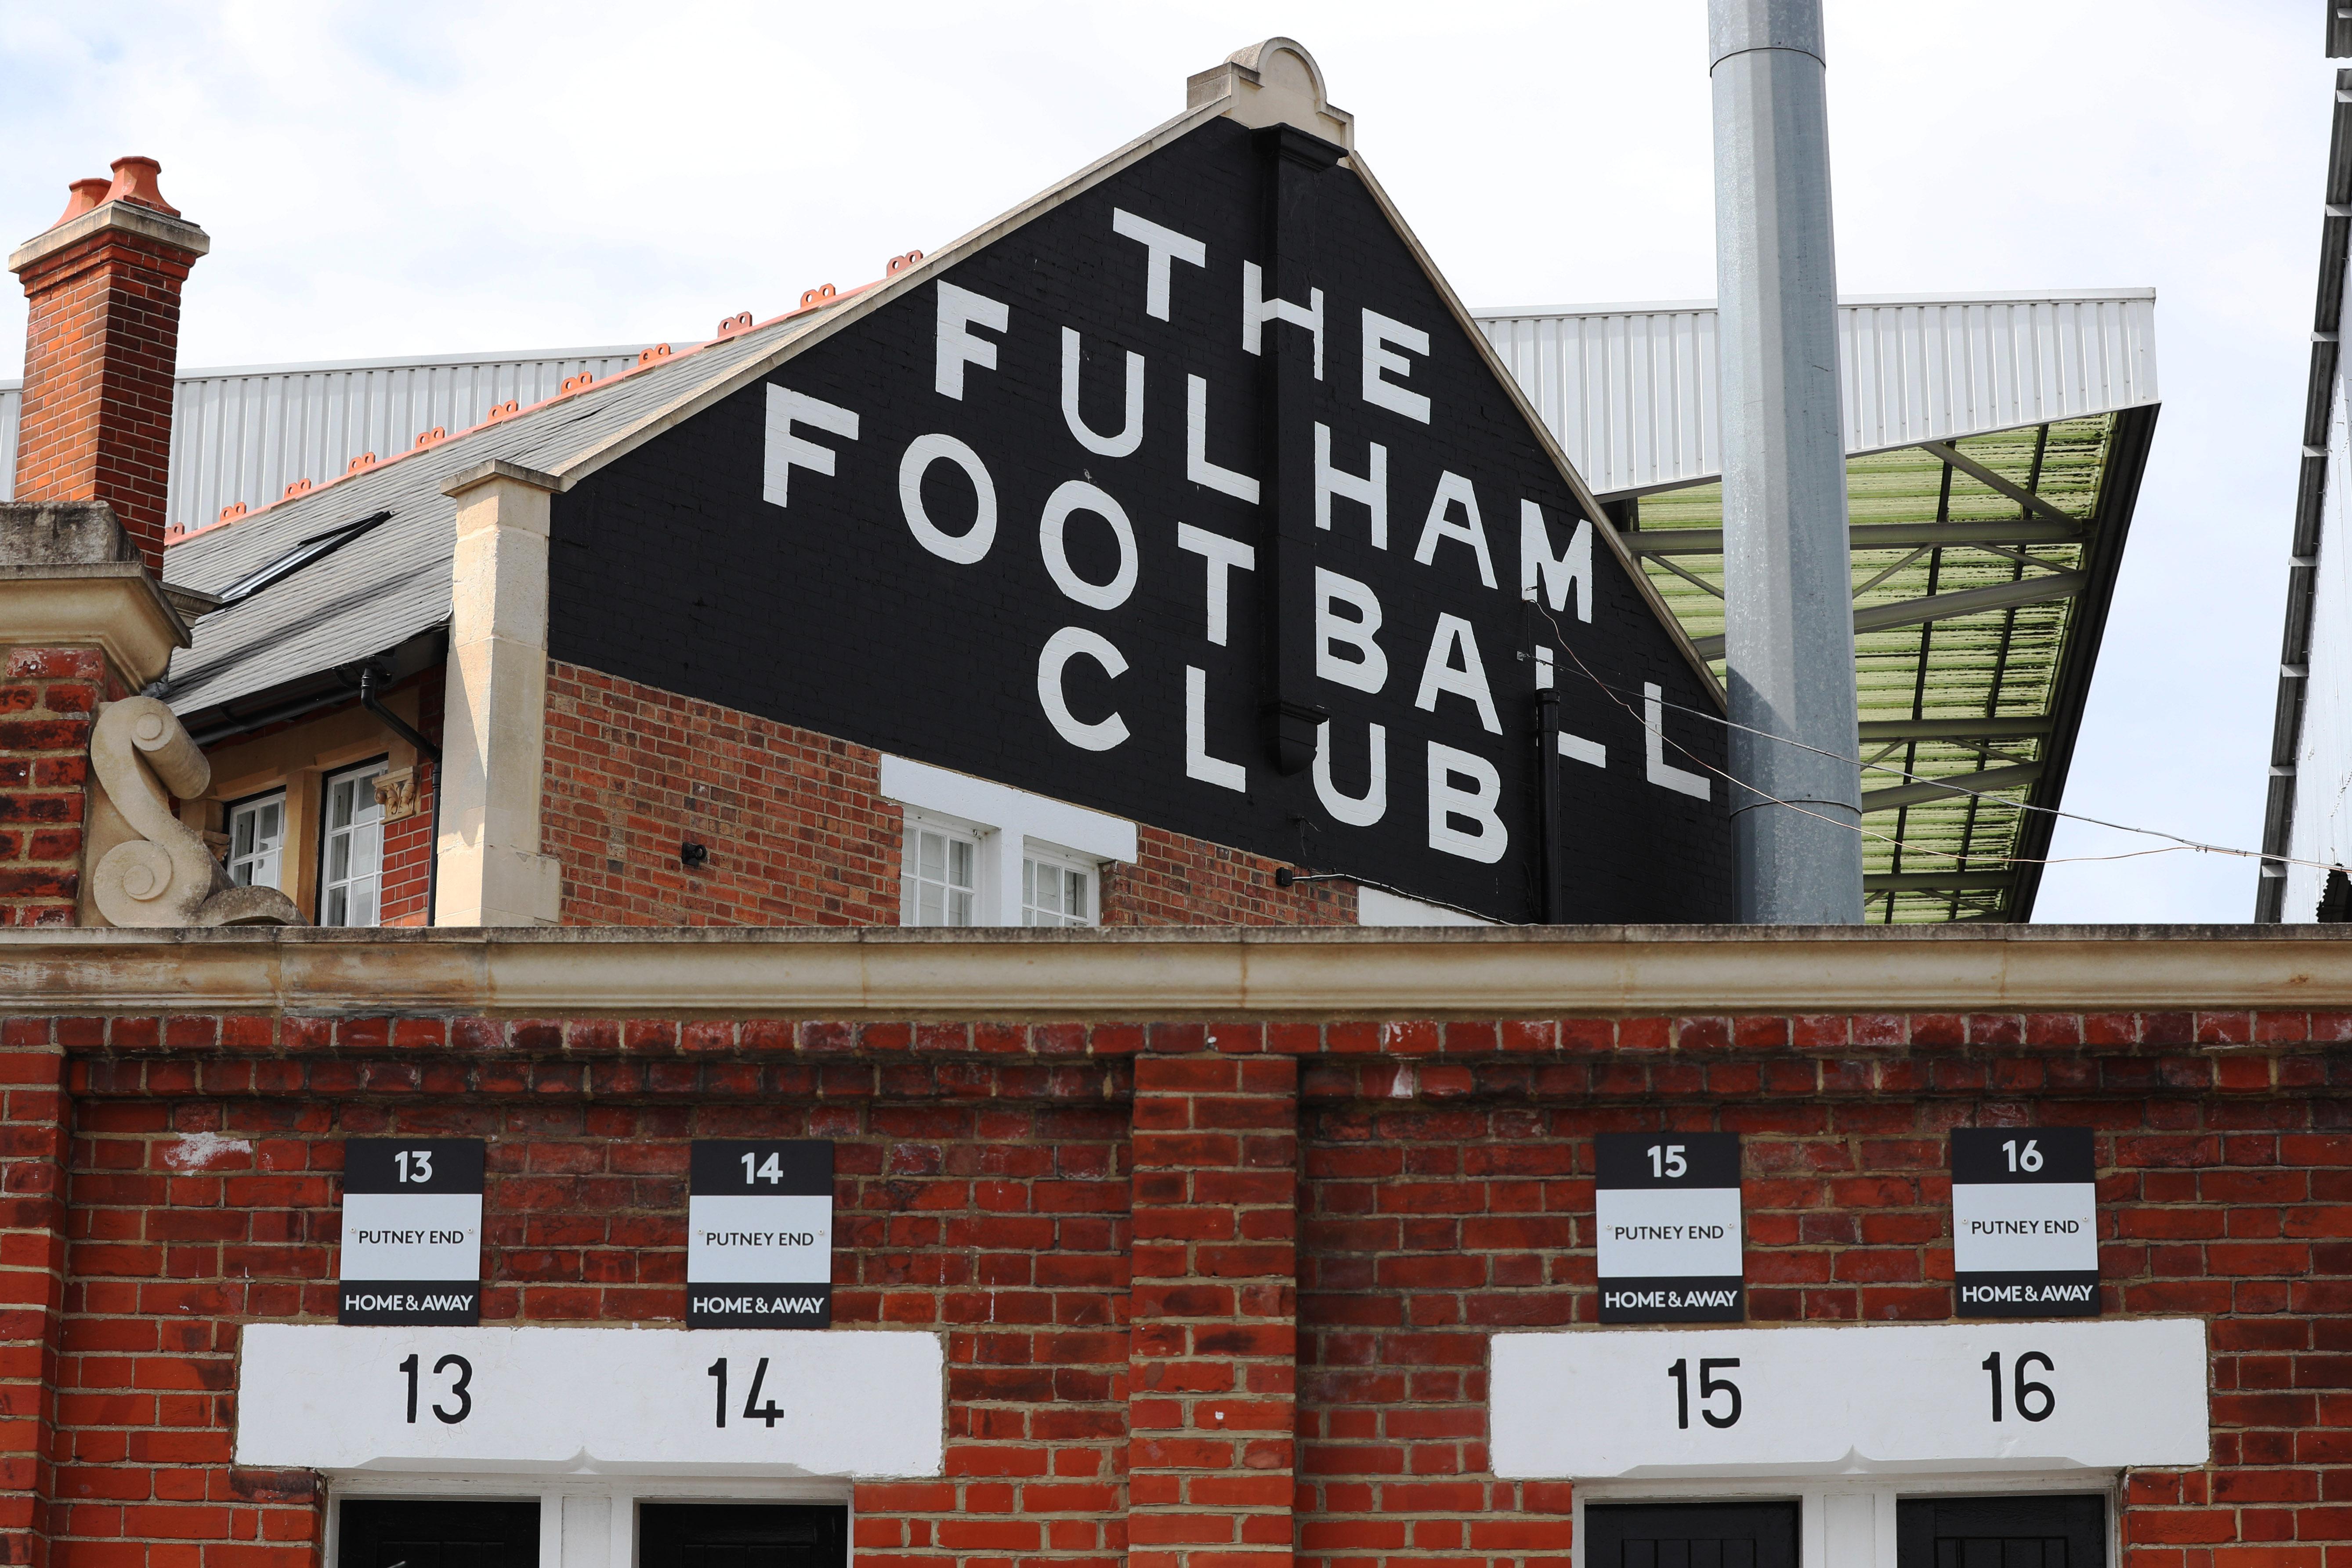 Fulham v Brentford - Championship Play Off Final - Previews